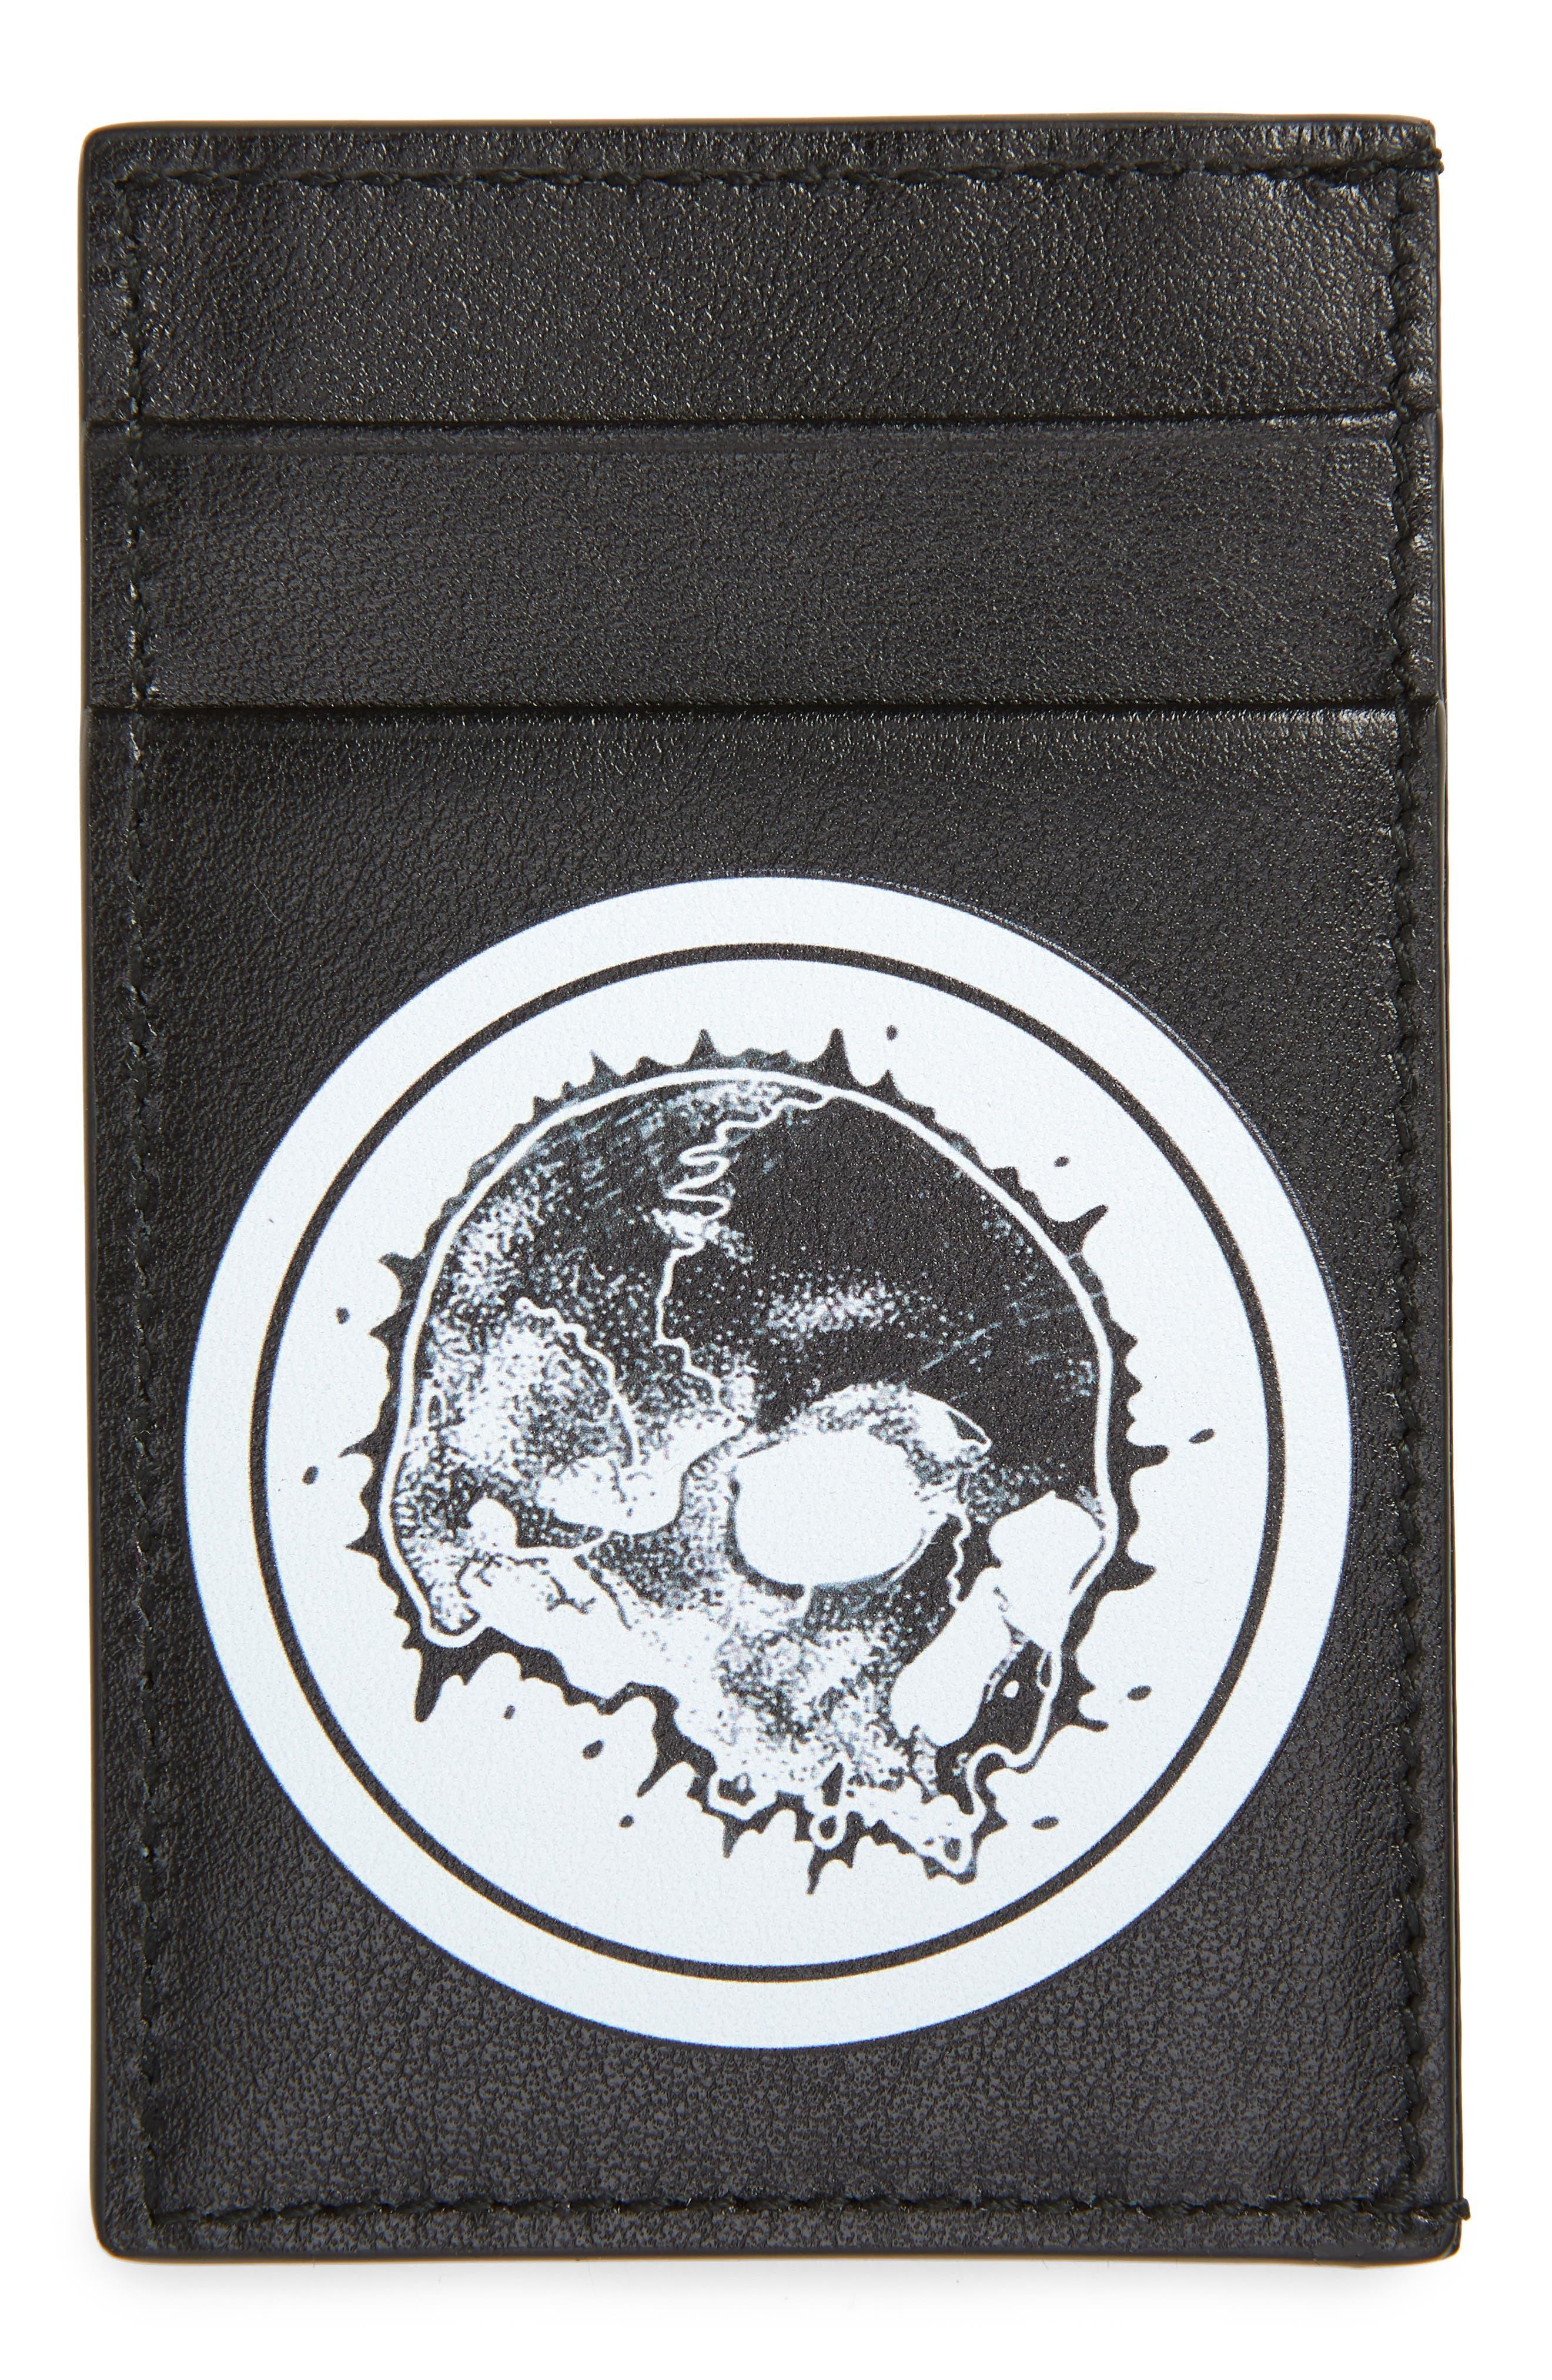 ALEXANDER MCQUEEN Skull Leather Card Case, Main, color, BLACK/ WHITE